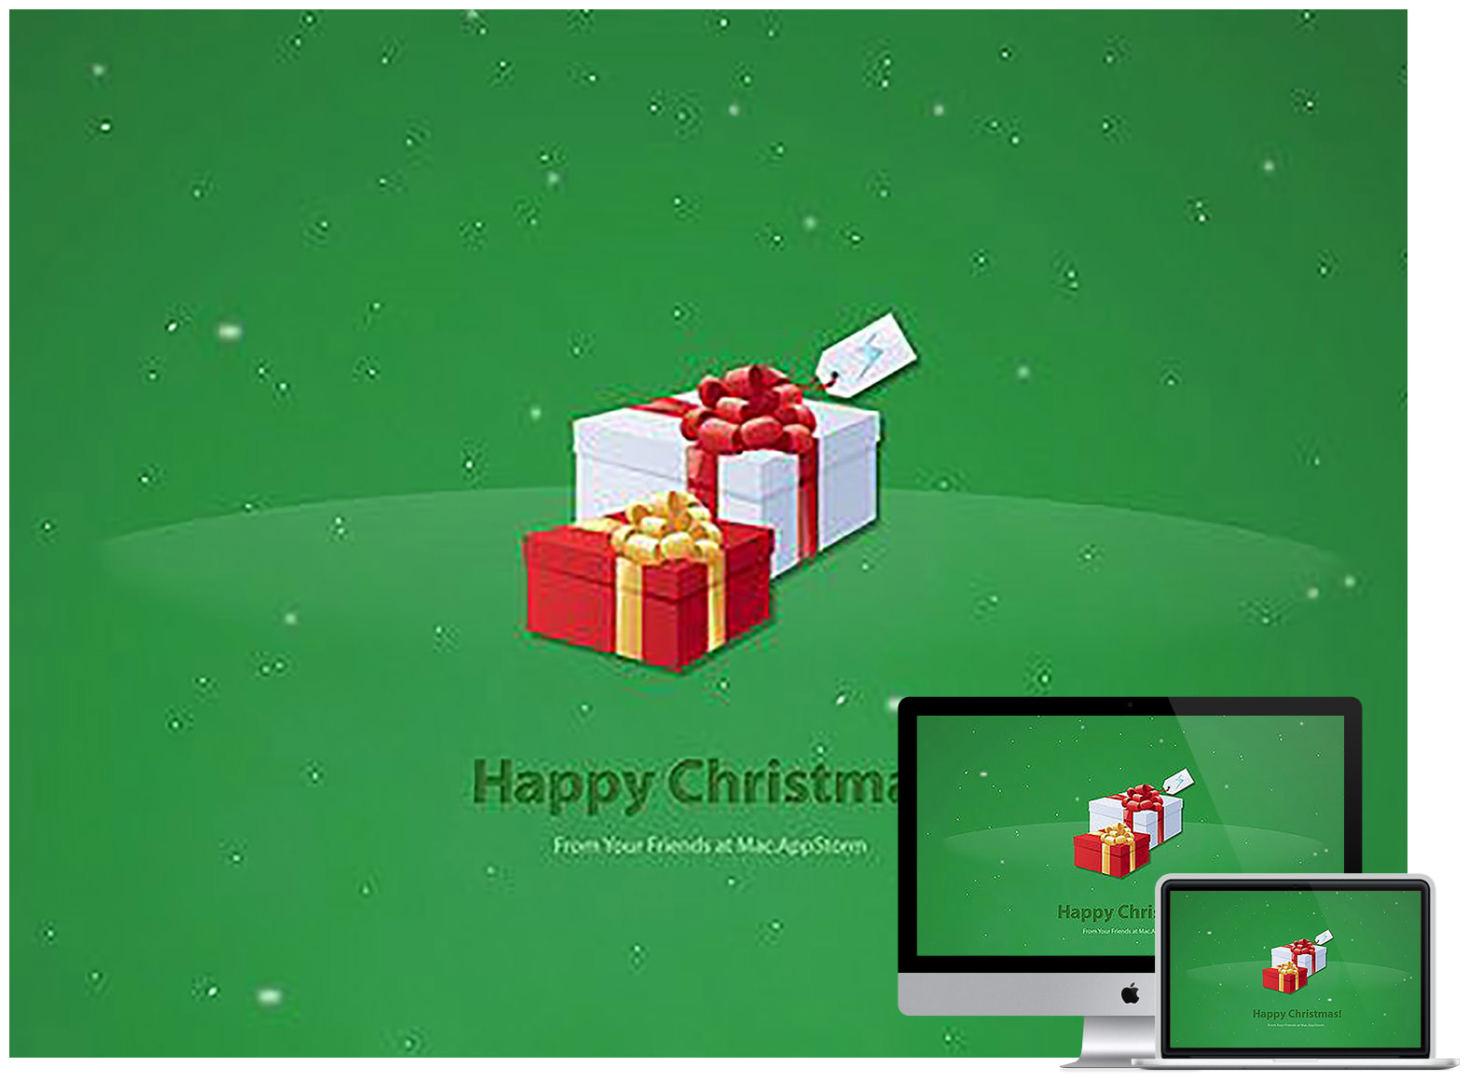 Christmas_wallpaper_Green